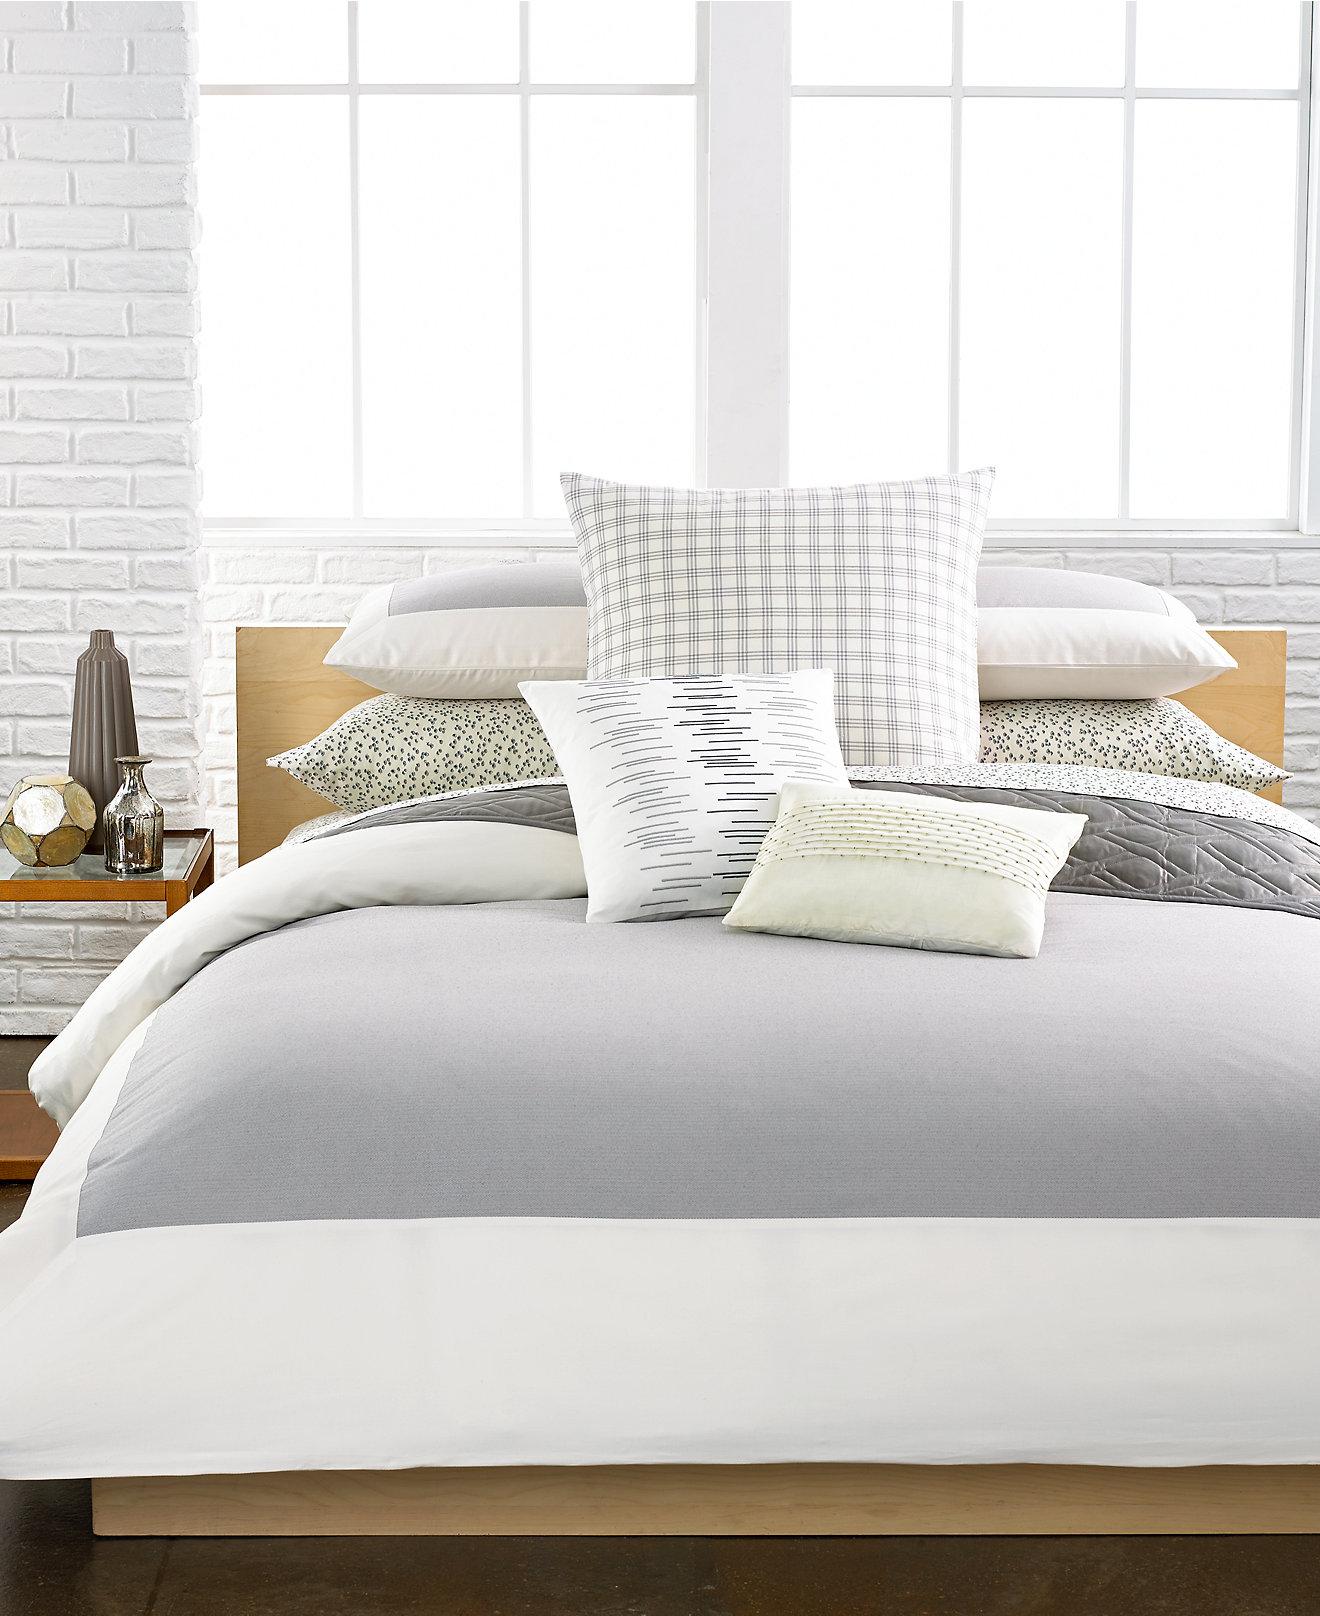 Macy Bedroom Furniture Closeout Closeout Calvin Klein Camden Bedding Collection Bedding